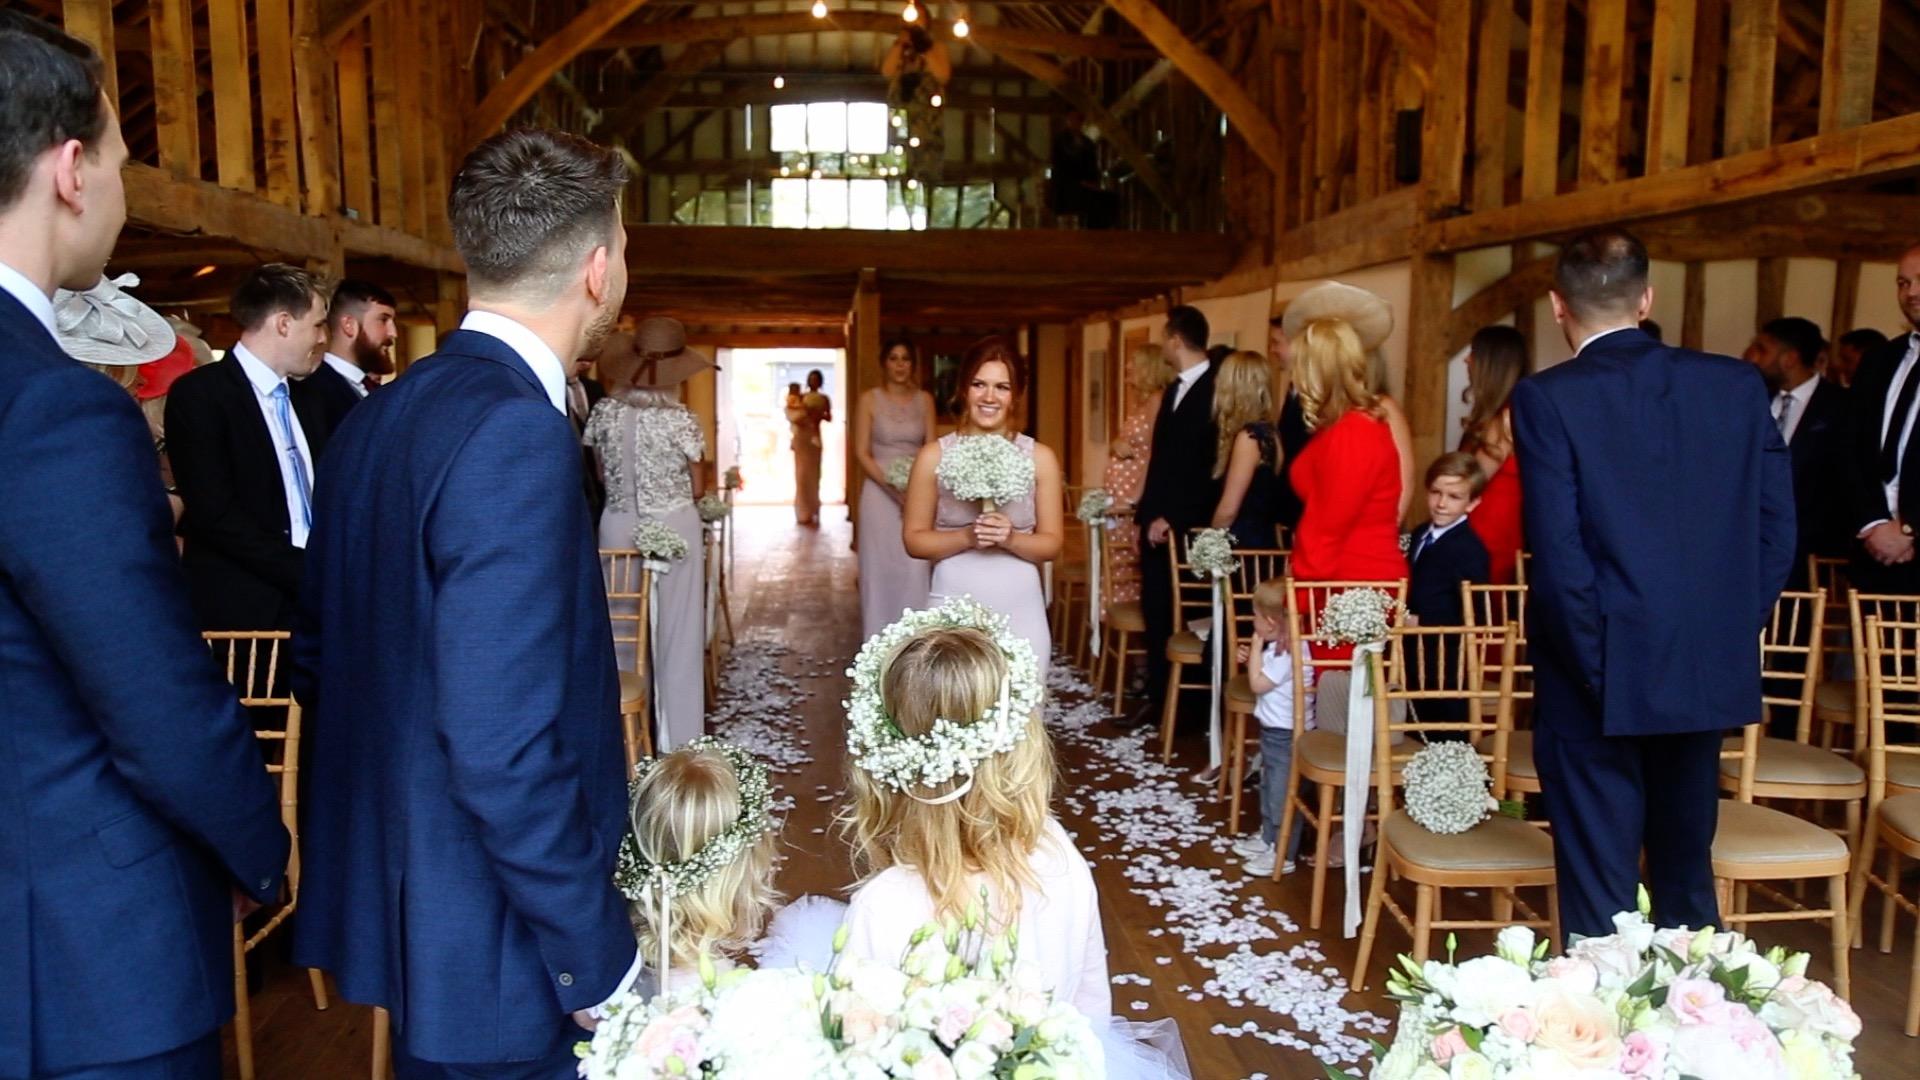 Lucy and Callum full edit bridesmaid walk.jpg